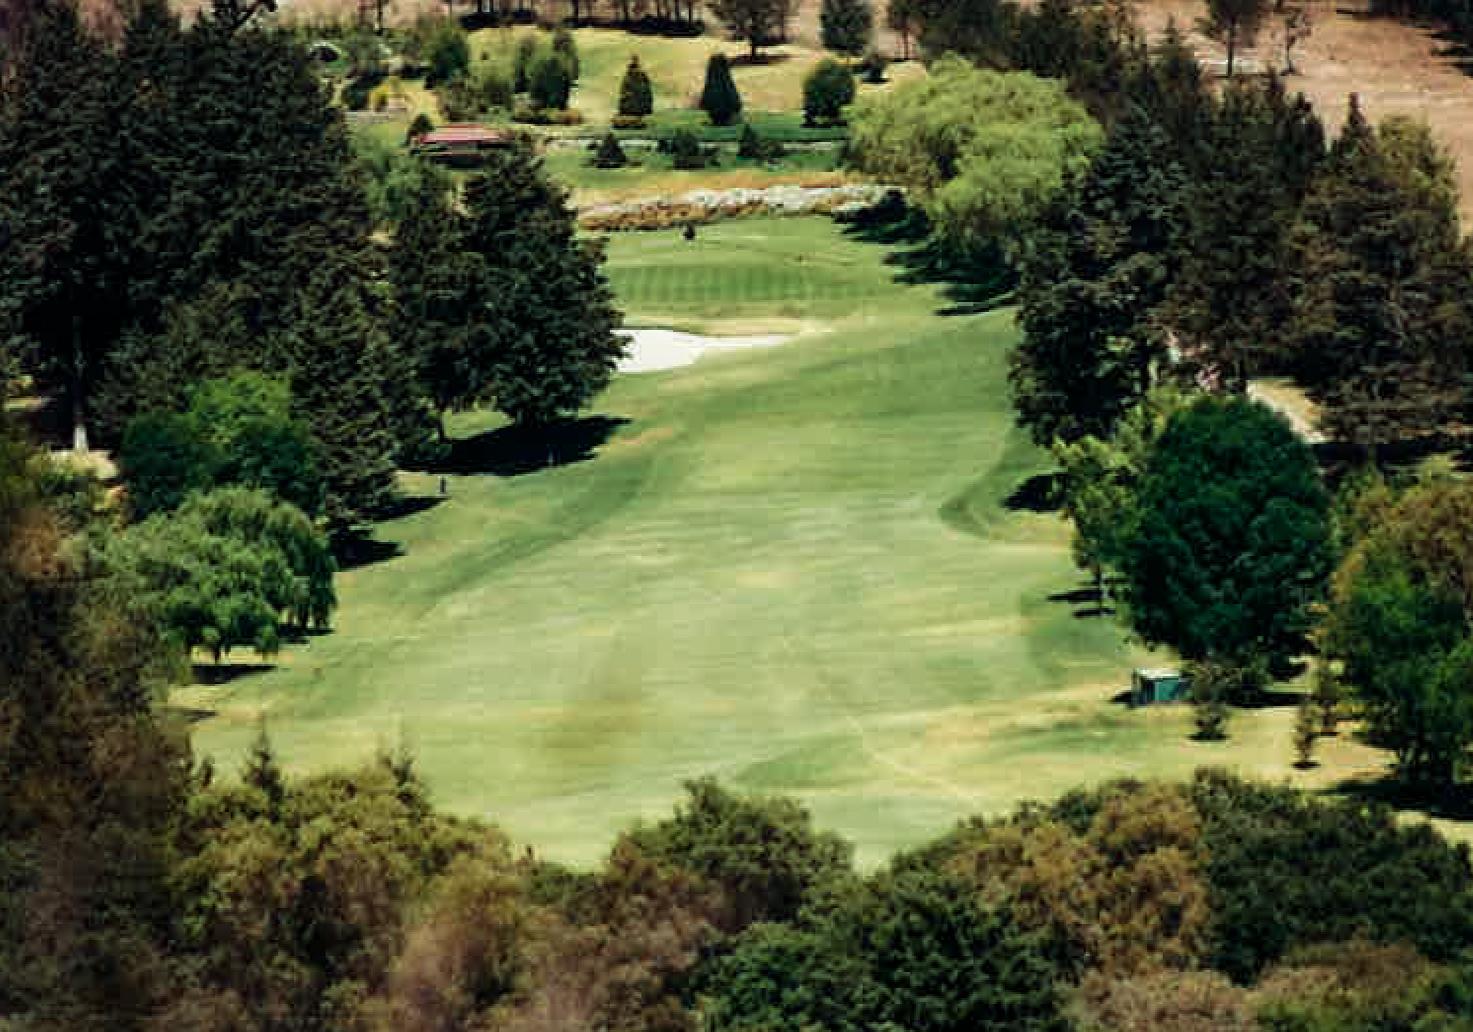 Campo de golf clásico desde 1975